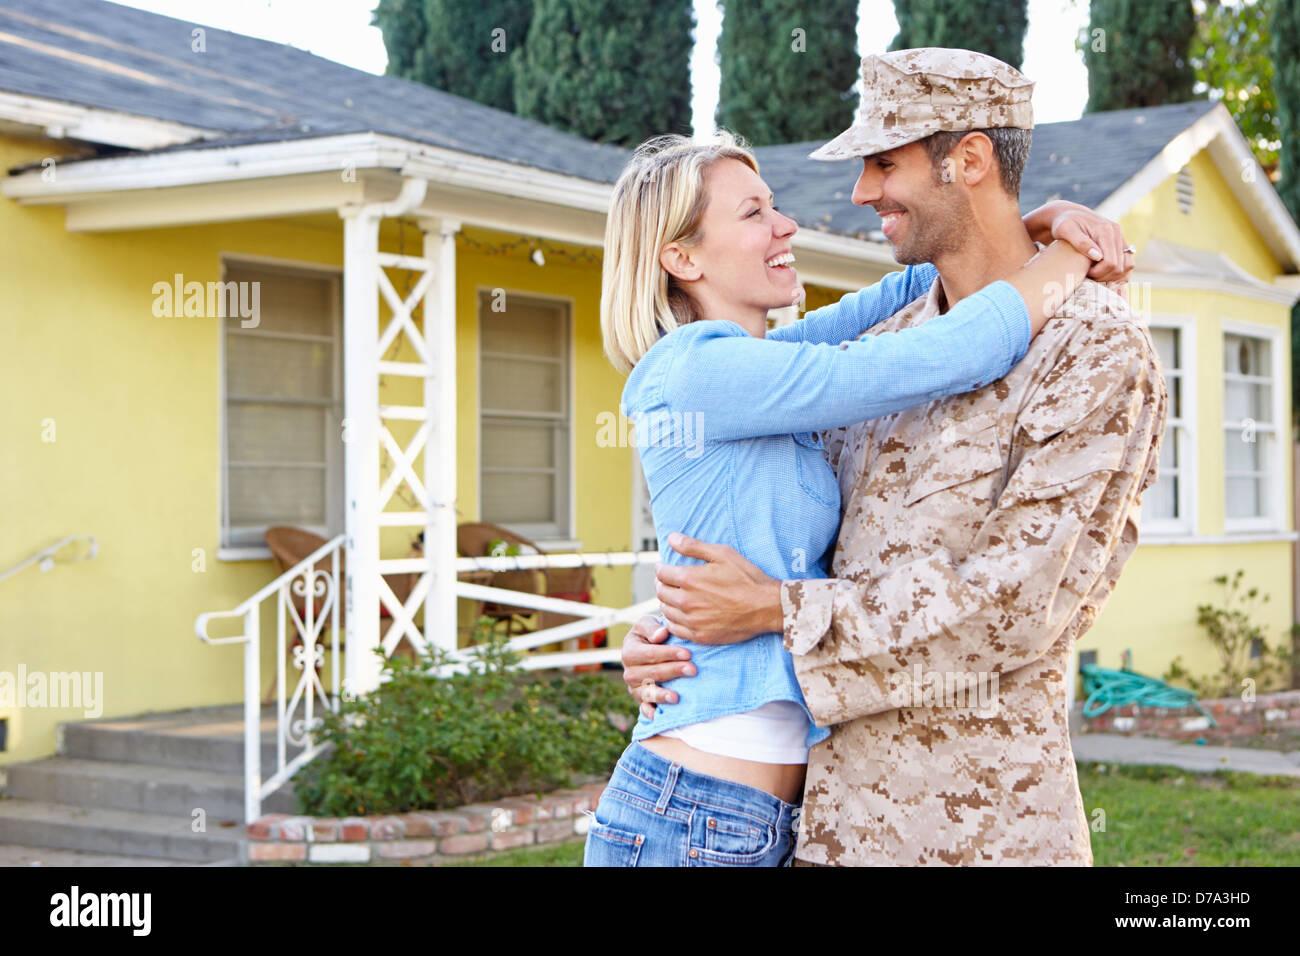 Frau Mann Zuhause Armee beurlaubt begrüßen Stockbild